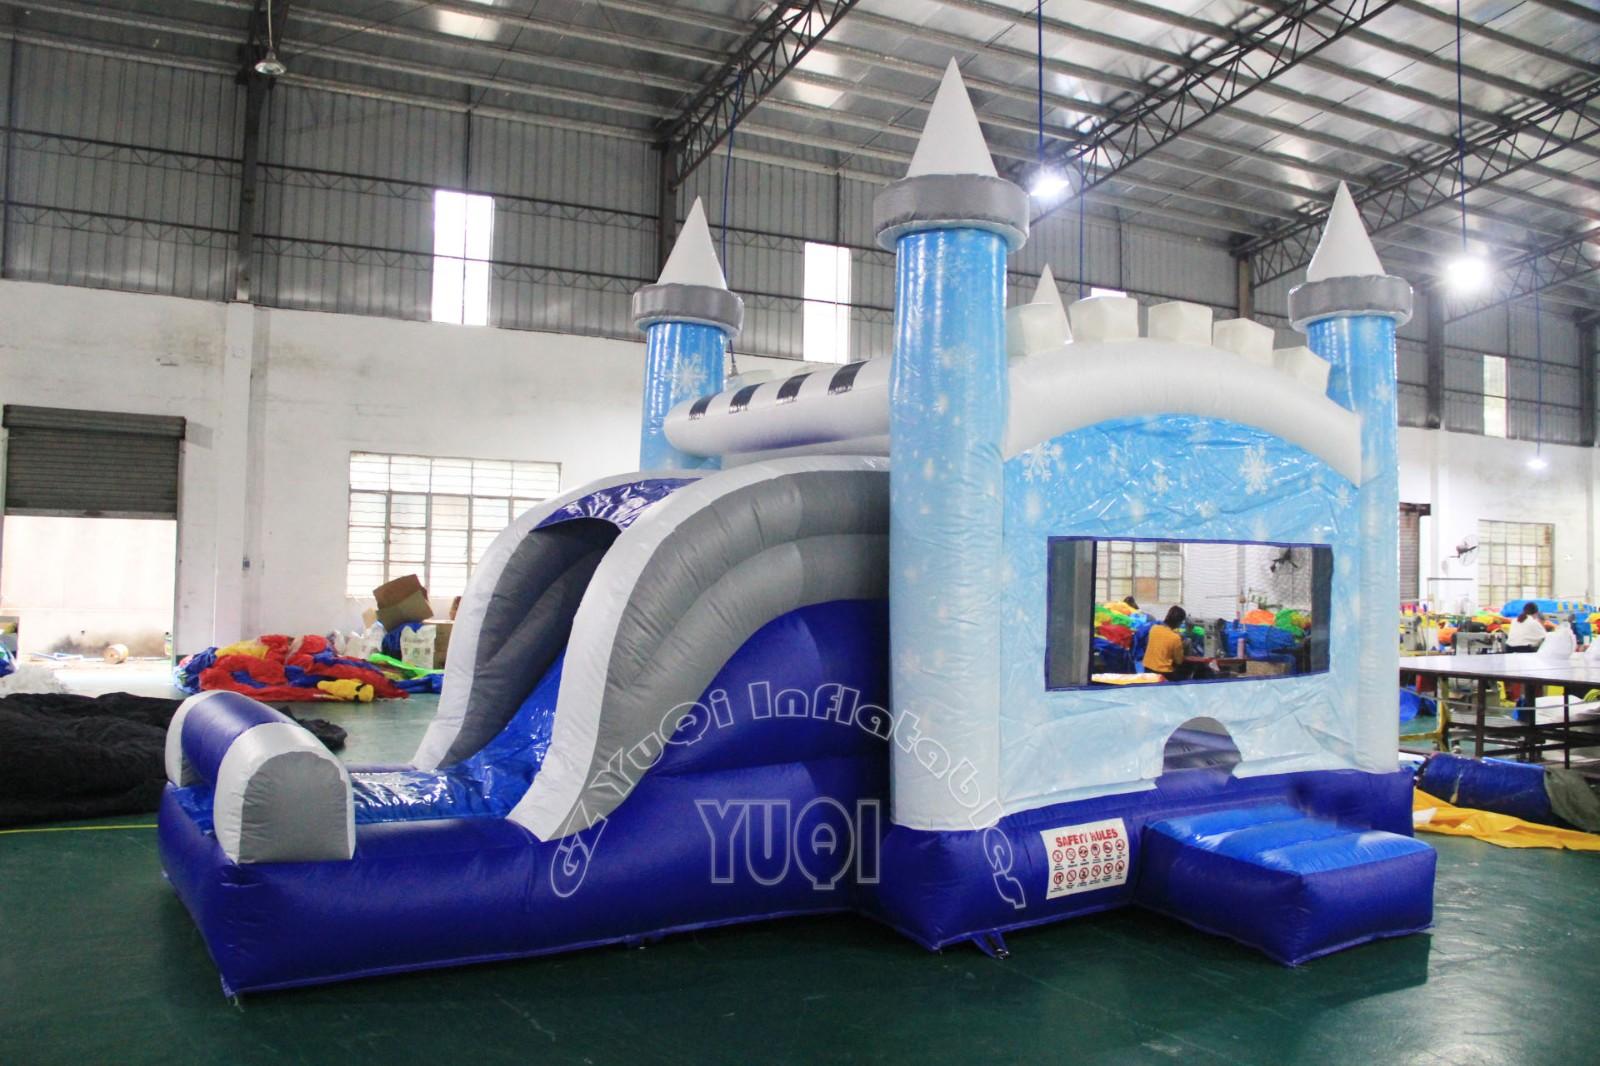 YUQI-Manufacturer Of Yq35 Buy Bounce House Slide Combo For Kids